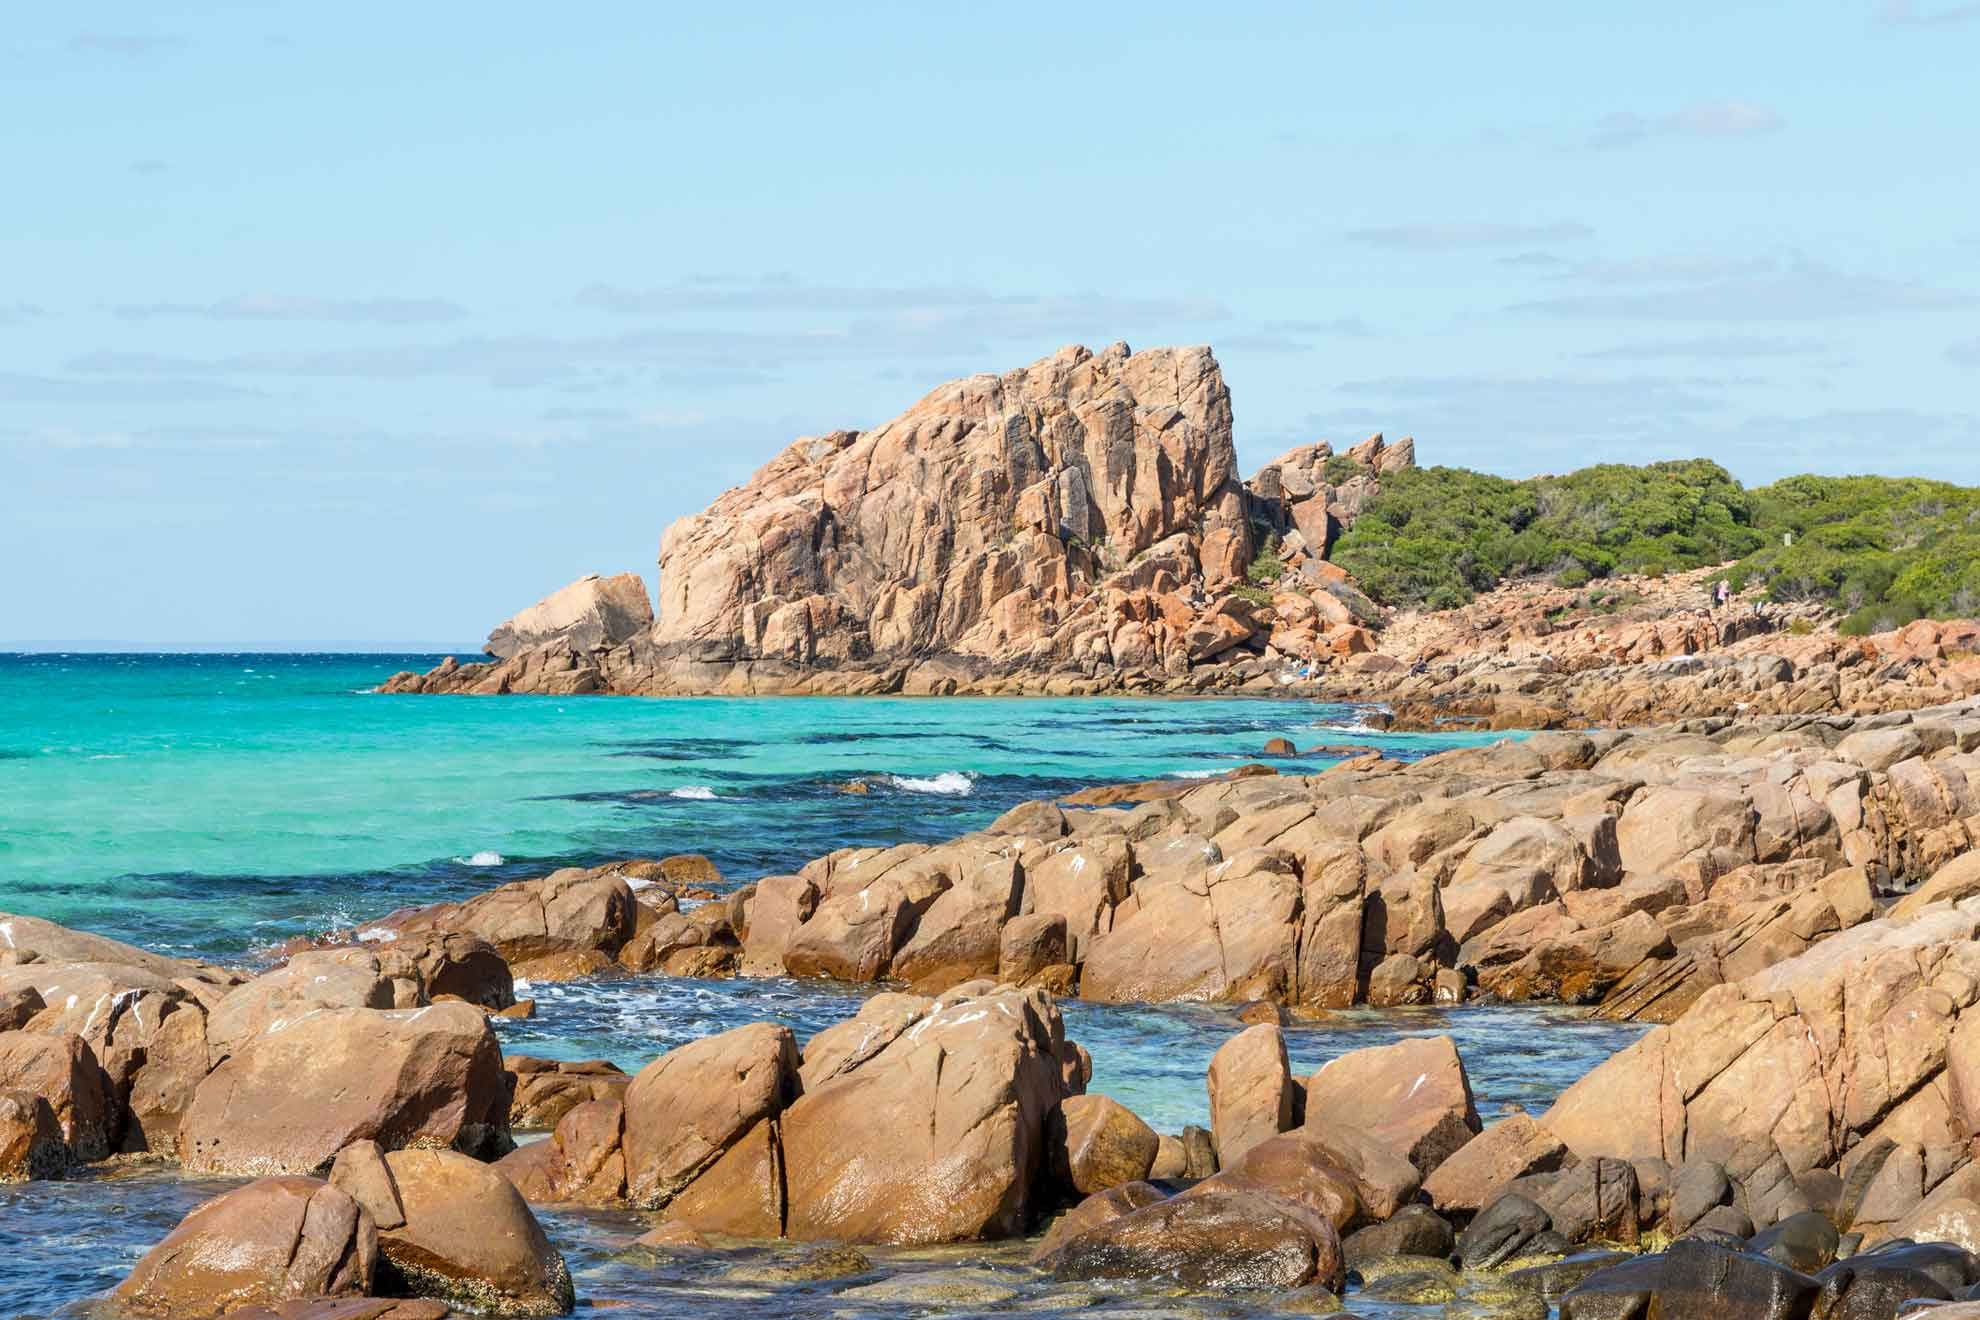 Cheap flights from London, UK to Sydney (SYD) , Australia...